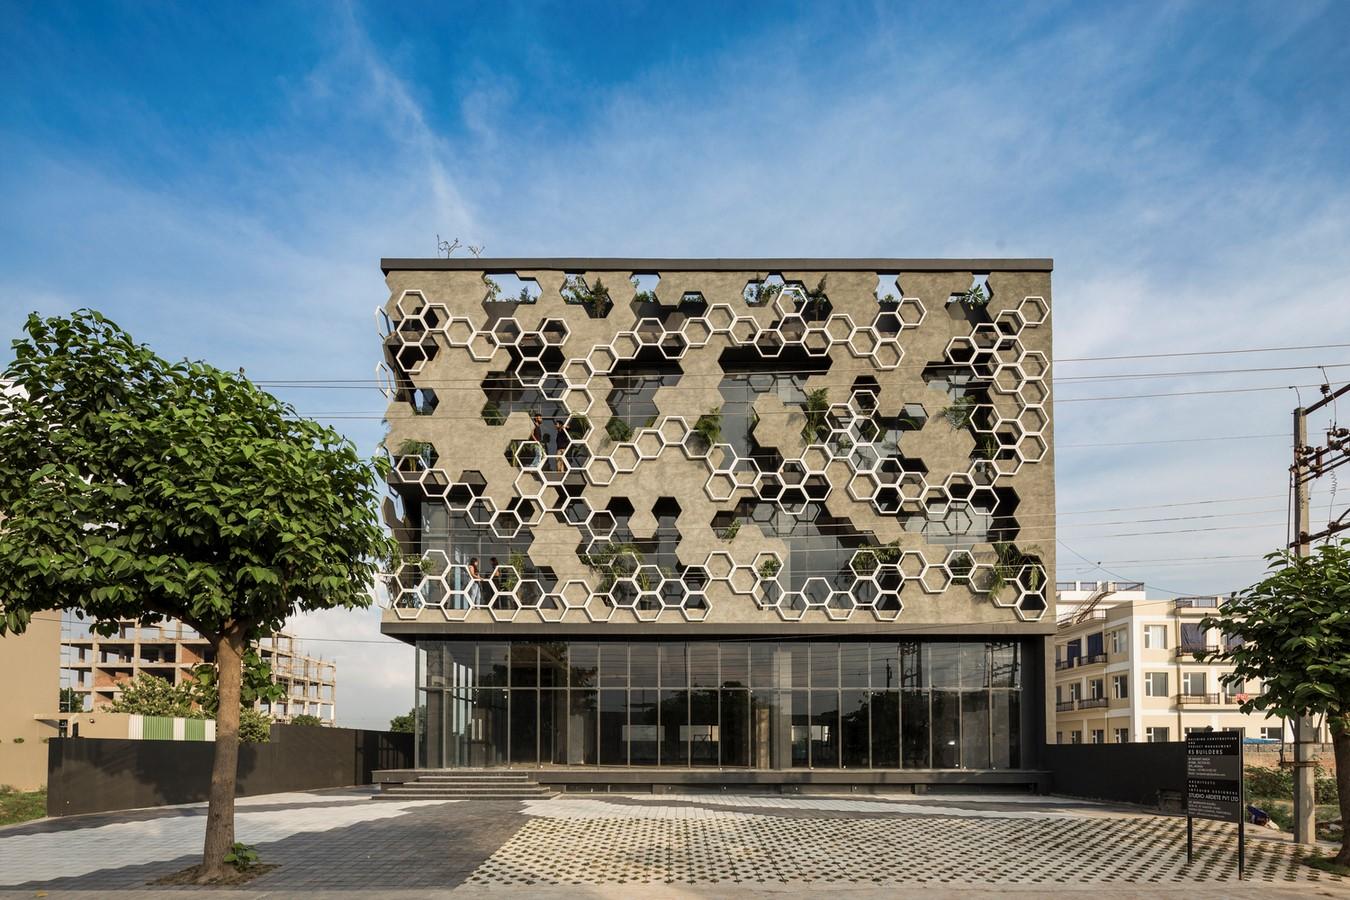 10 Examples of Innovative facade design solutions - Sheet27